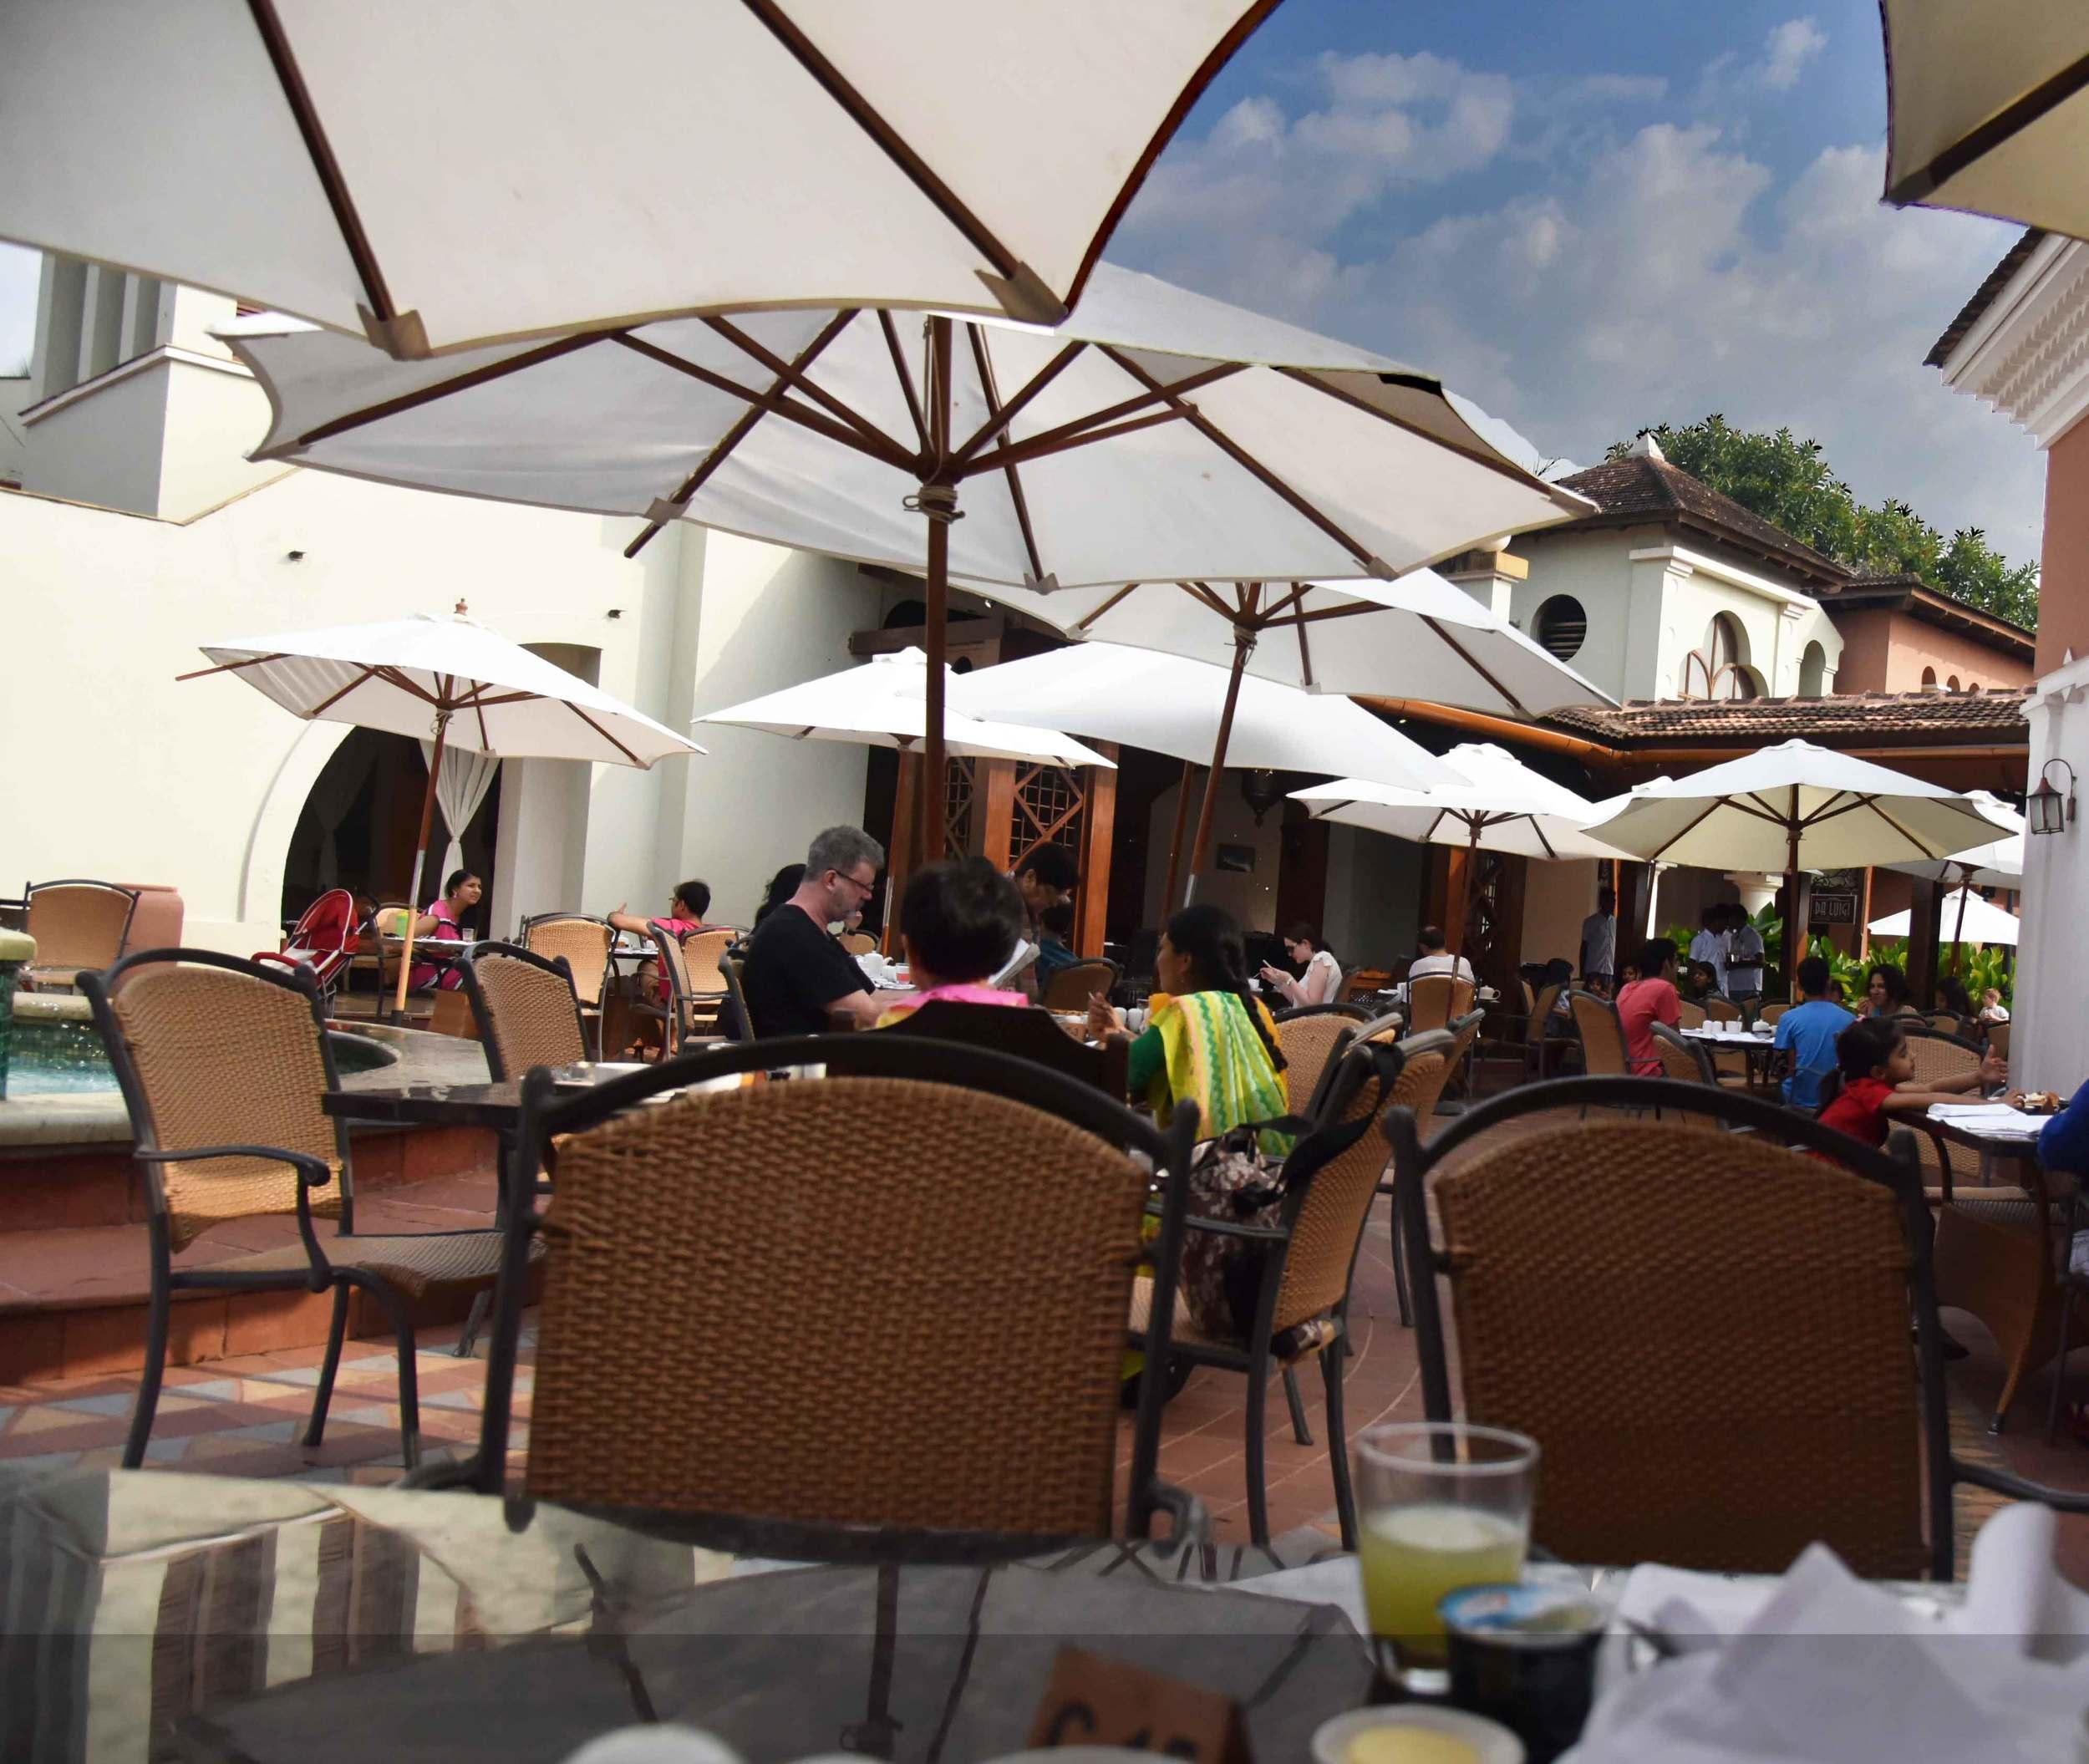 Breakfast was never so fun! Park Hyatt Hotel, Goa, image©sourcingstyle.com.